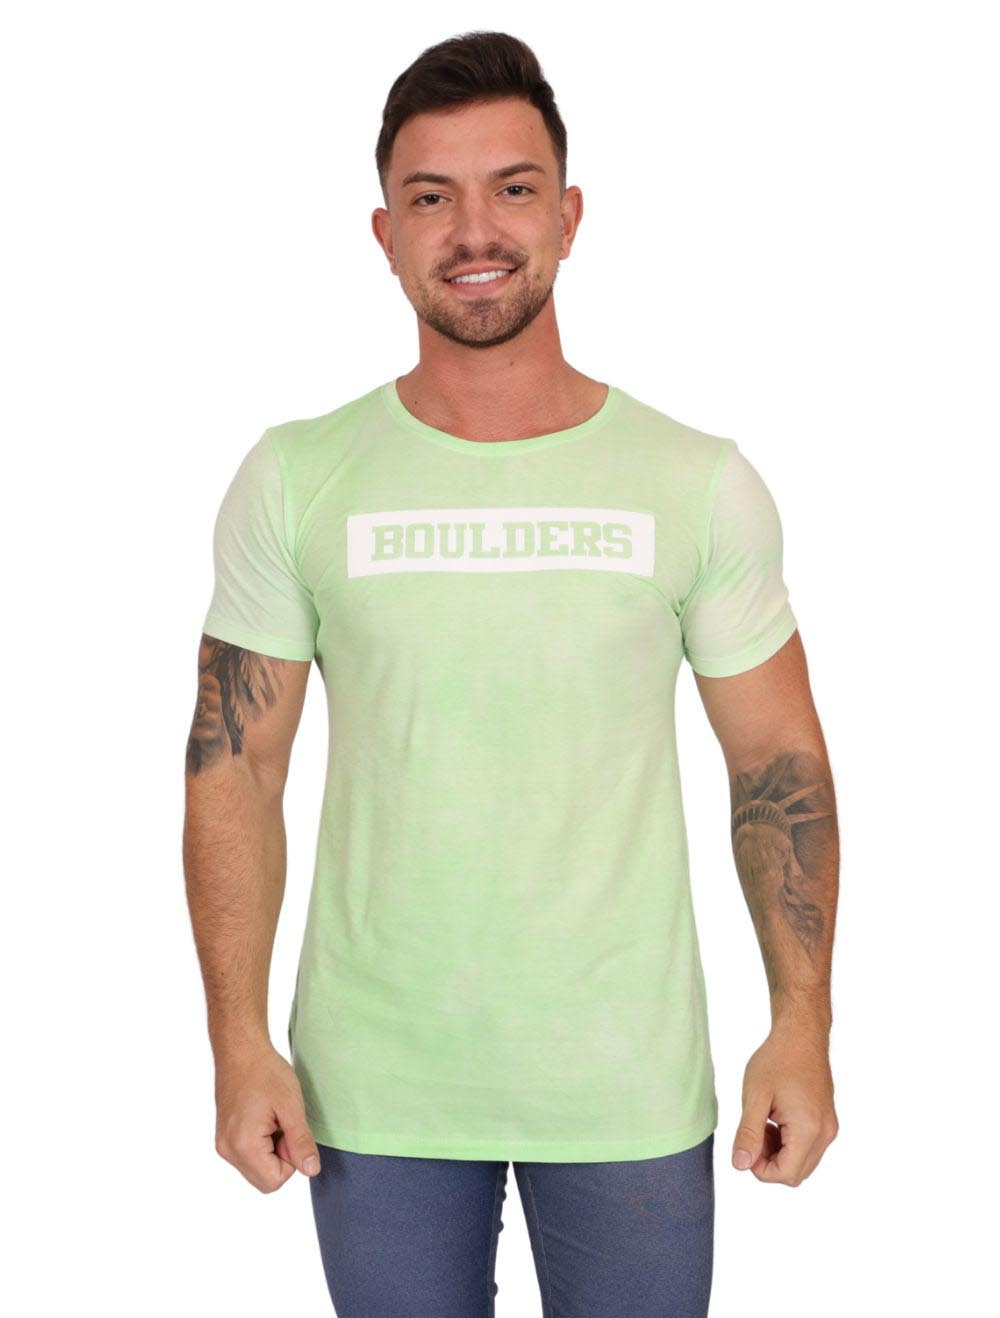 Camiseta Masculina Estampada Boulders Verde